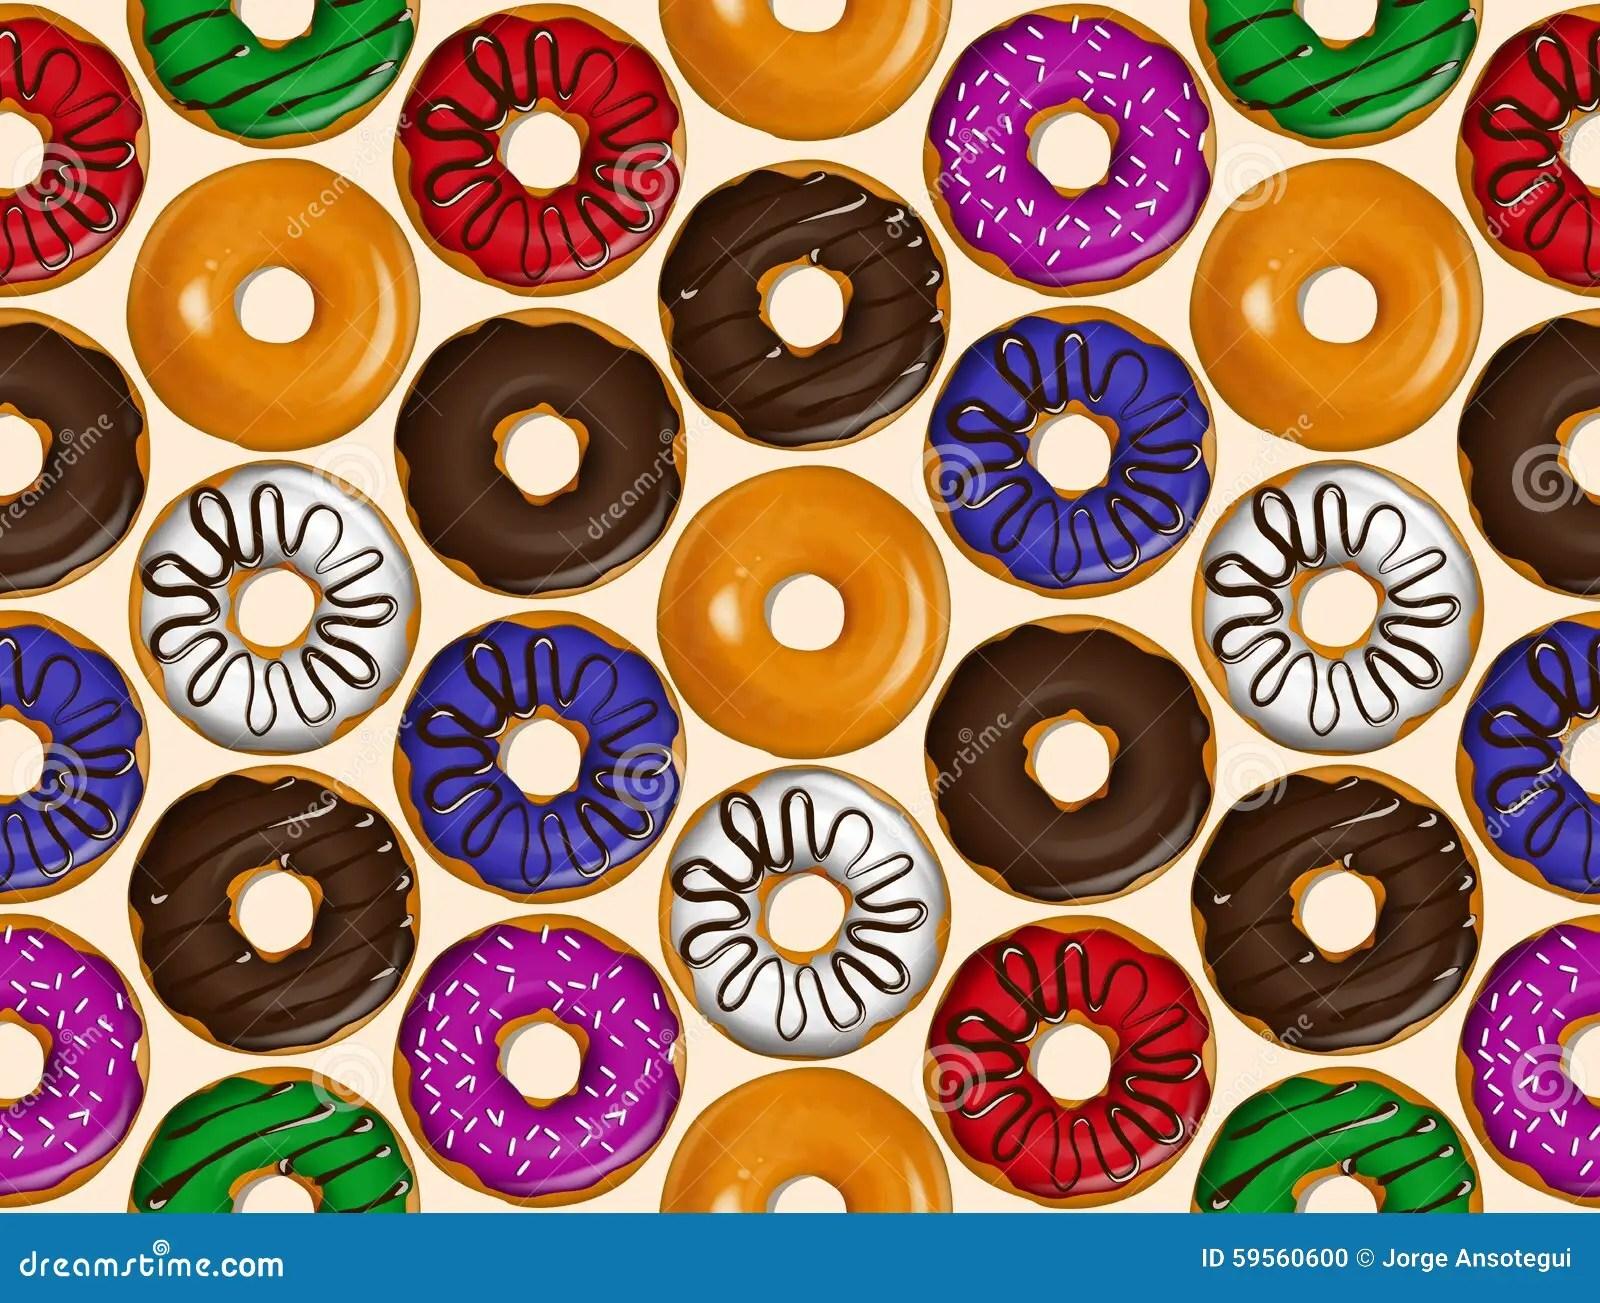 Cute Bakery Wallpaper Seamless Pattern Of Donuts Donut Pattern Vector Stock